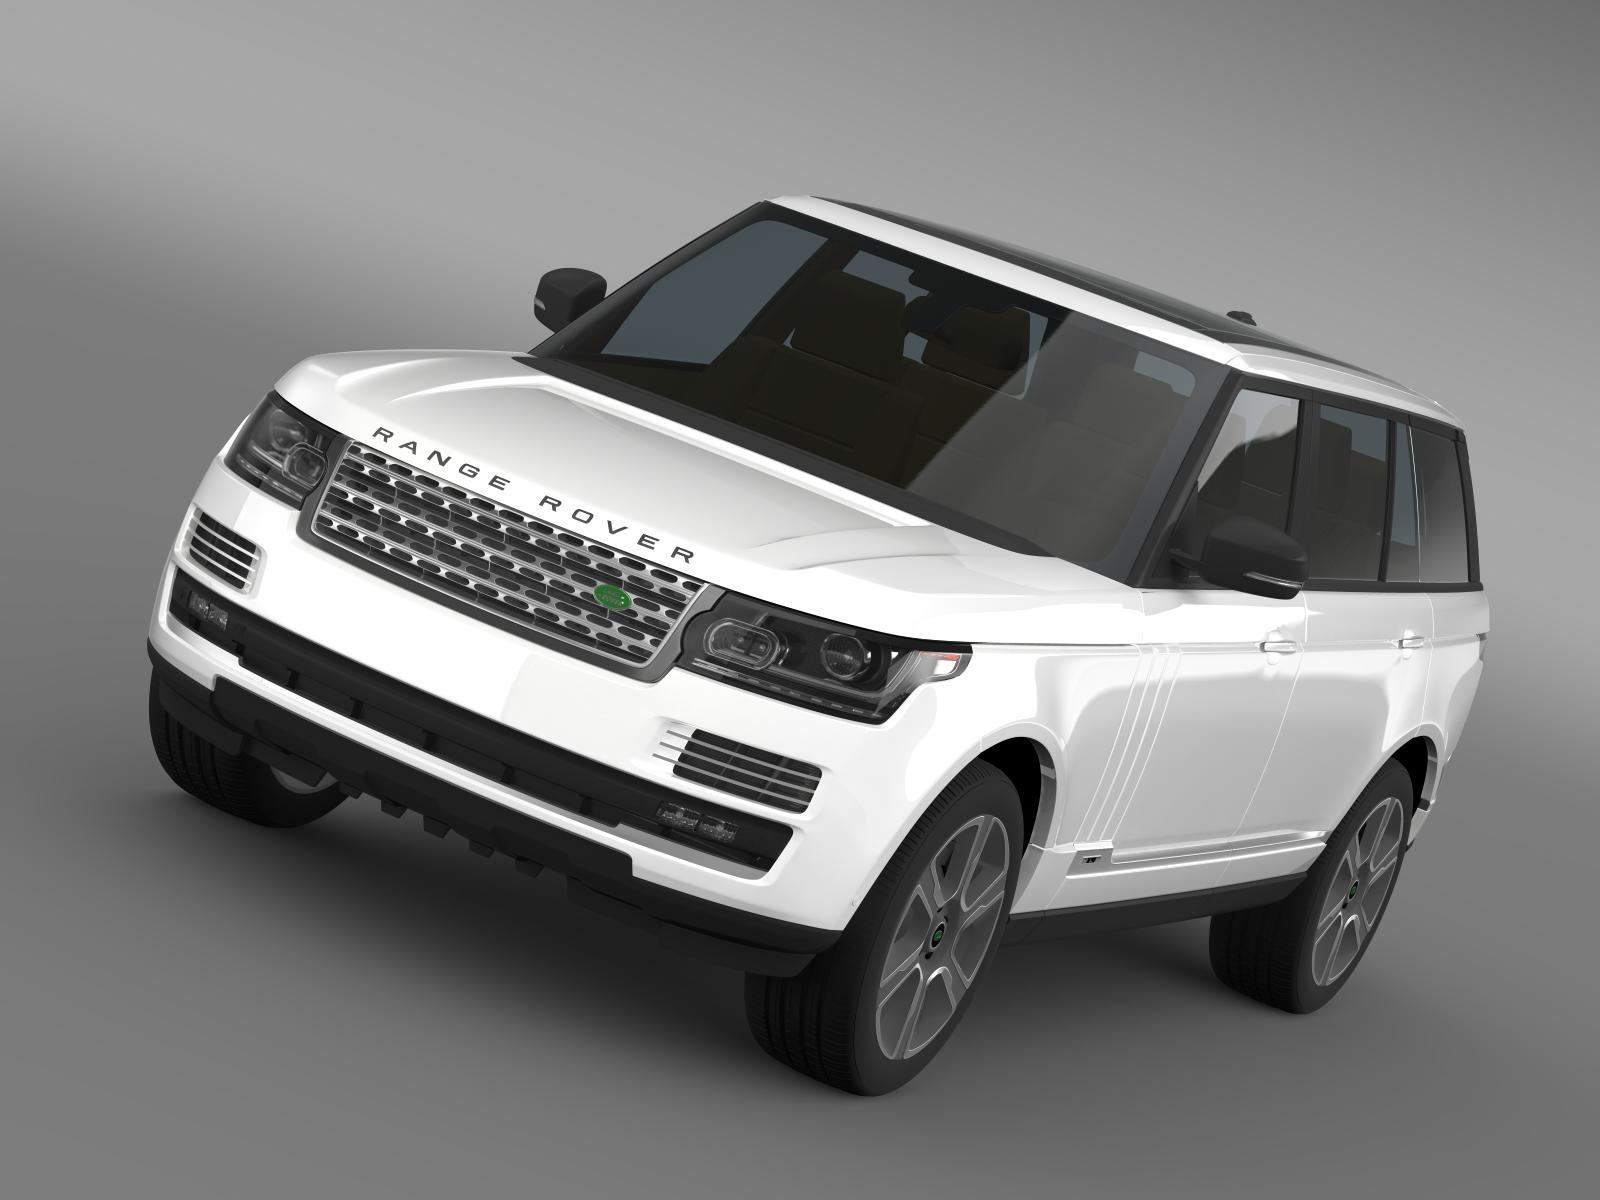 range rover hybrid lwb l405 3d model 3ds max fbx c4d lwo ma mb hrc xsi obj 162128